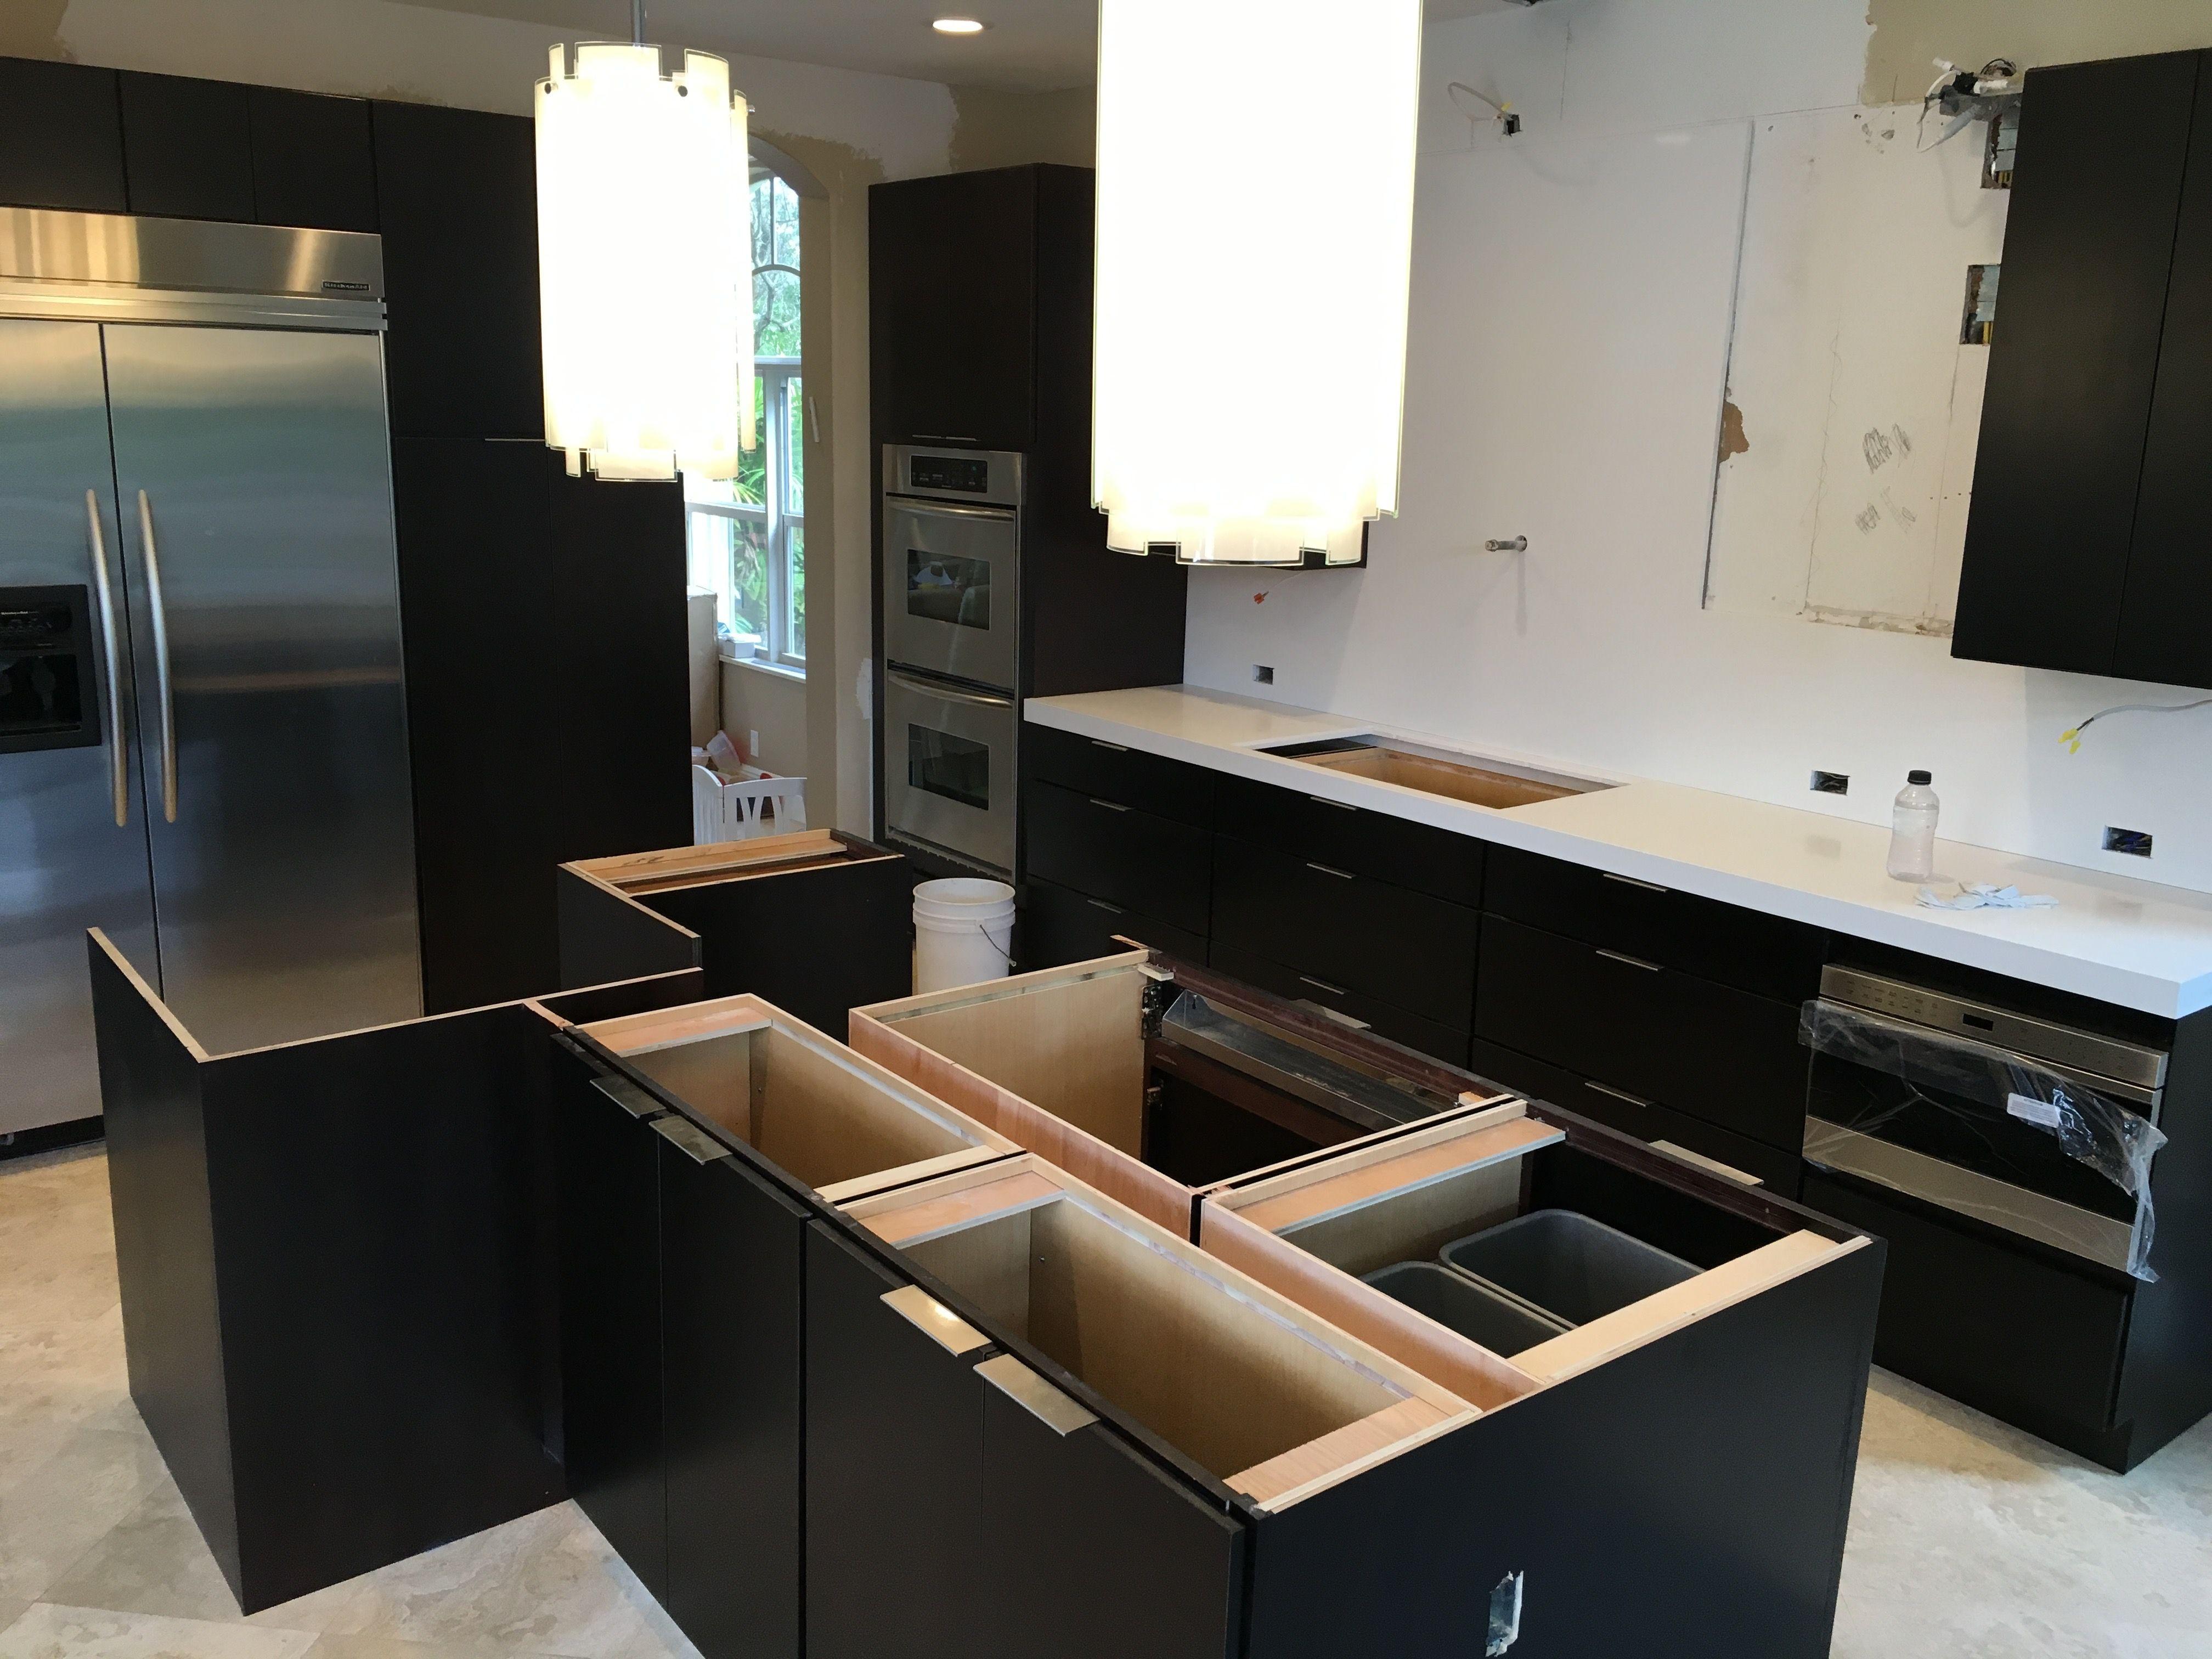 Quartz kitchen countertops fabricators near me feel free to contact us stone and quartz llc